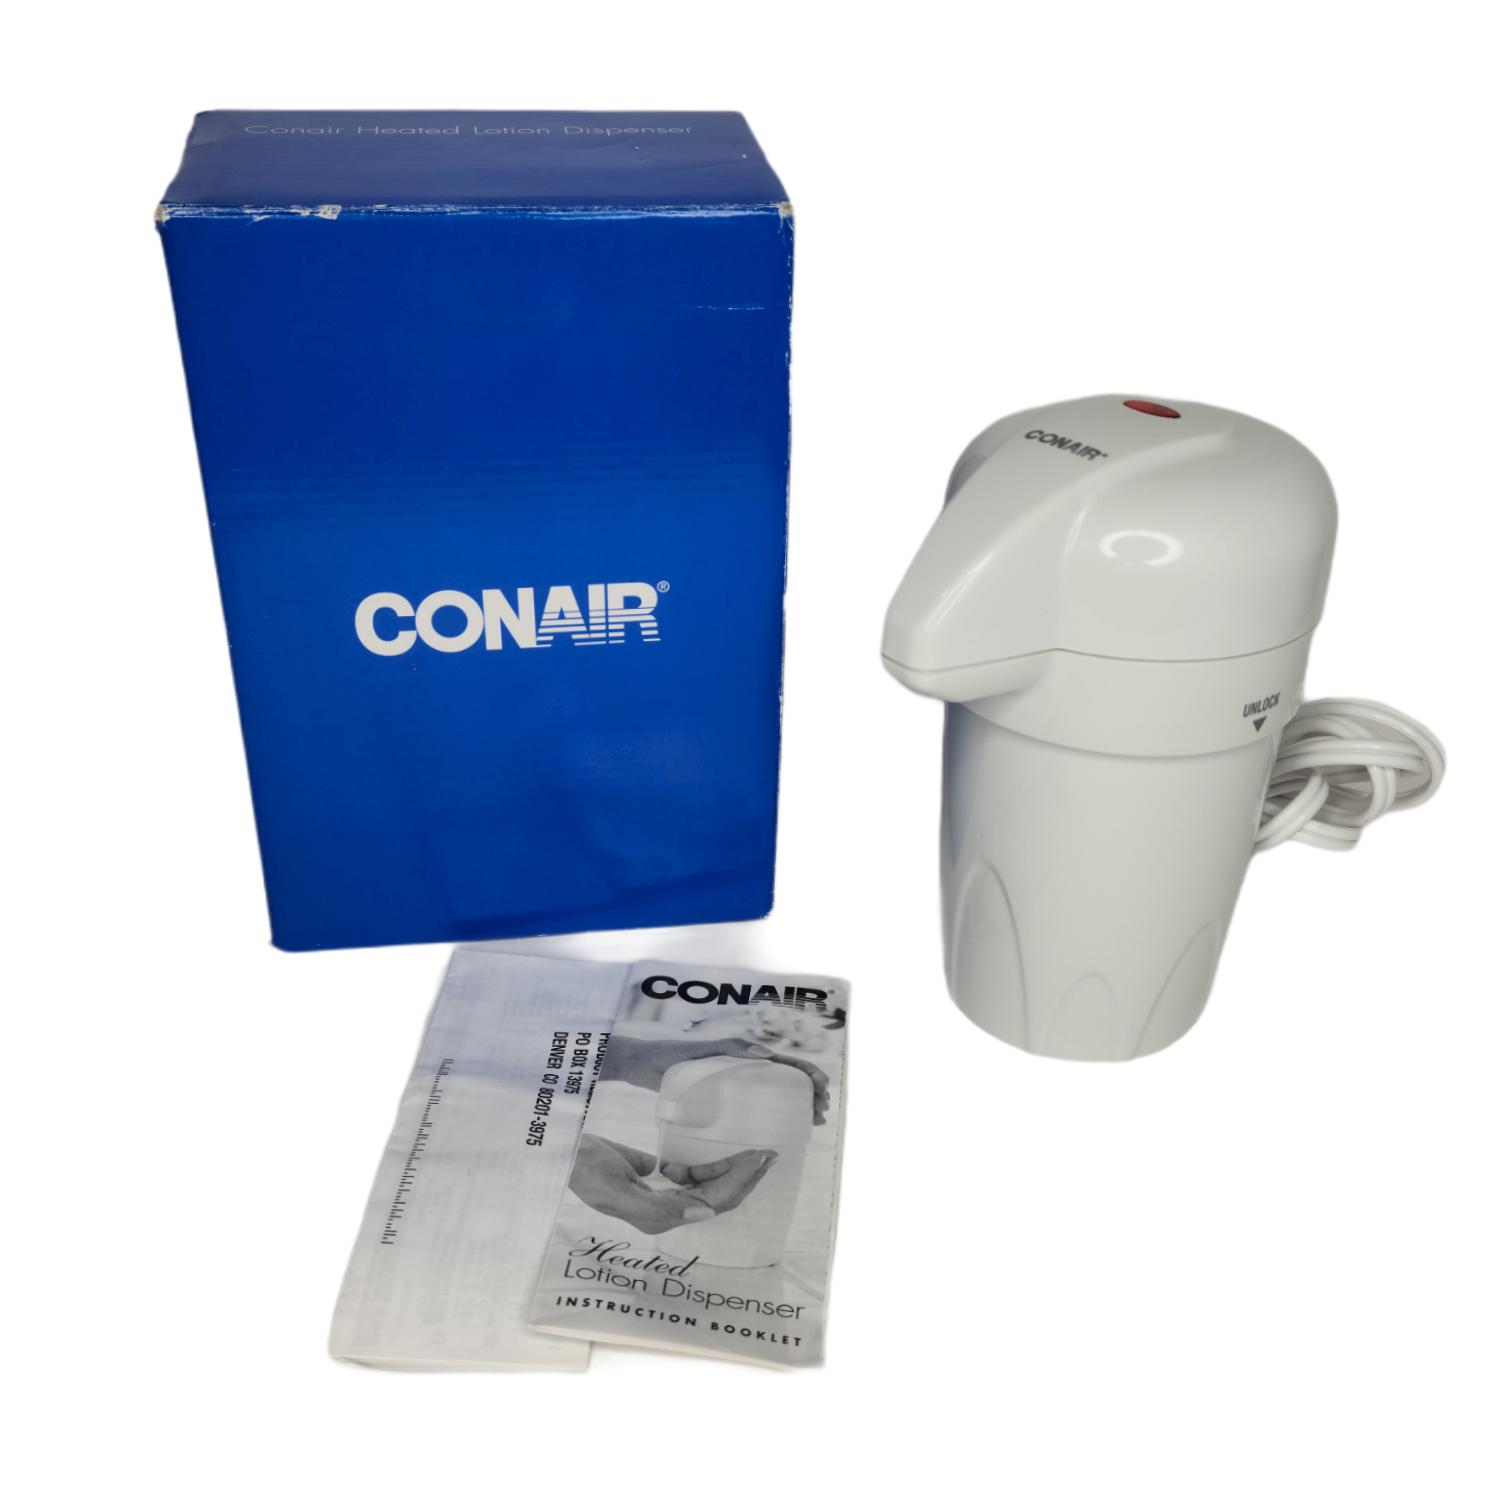 CONAIR Heated Hot Lotion Dispenser Warmer Body / Hand / Baby HLD22 Avon Open Box